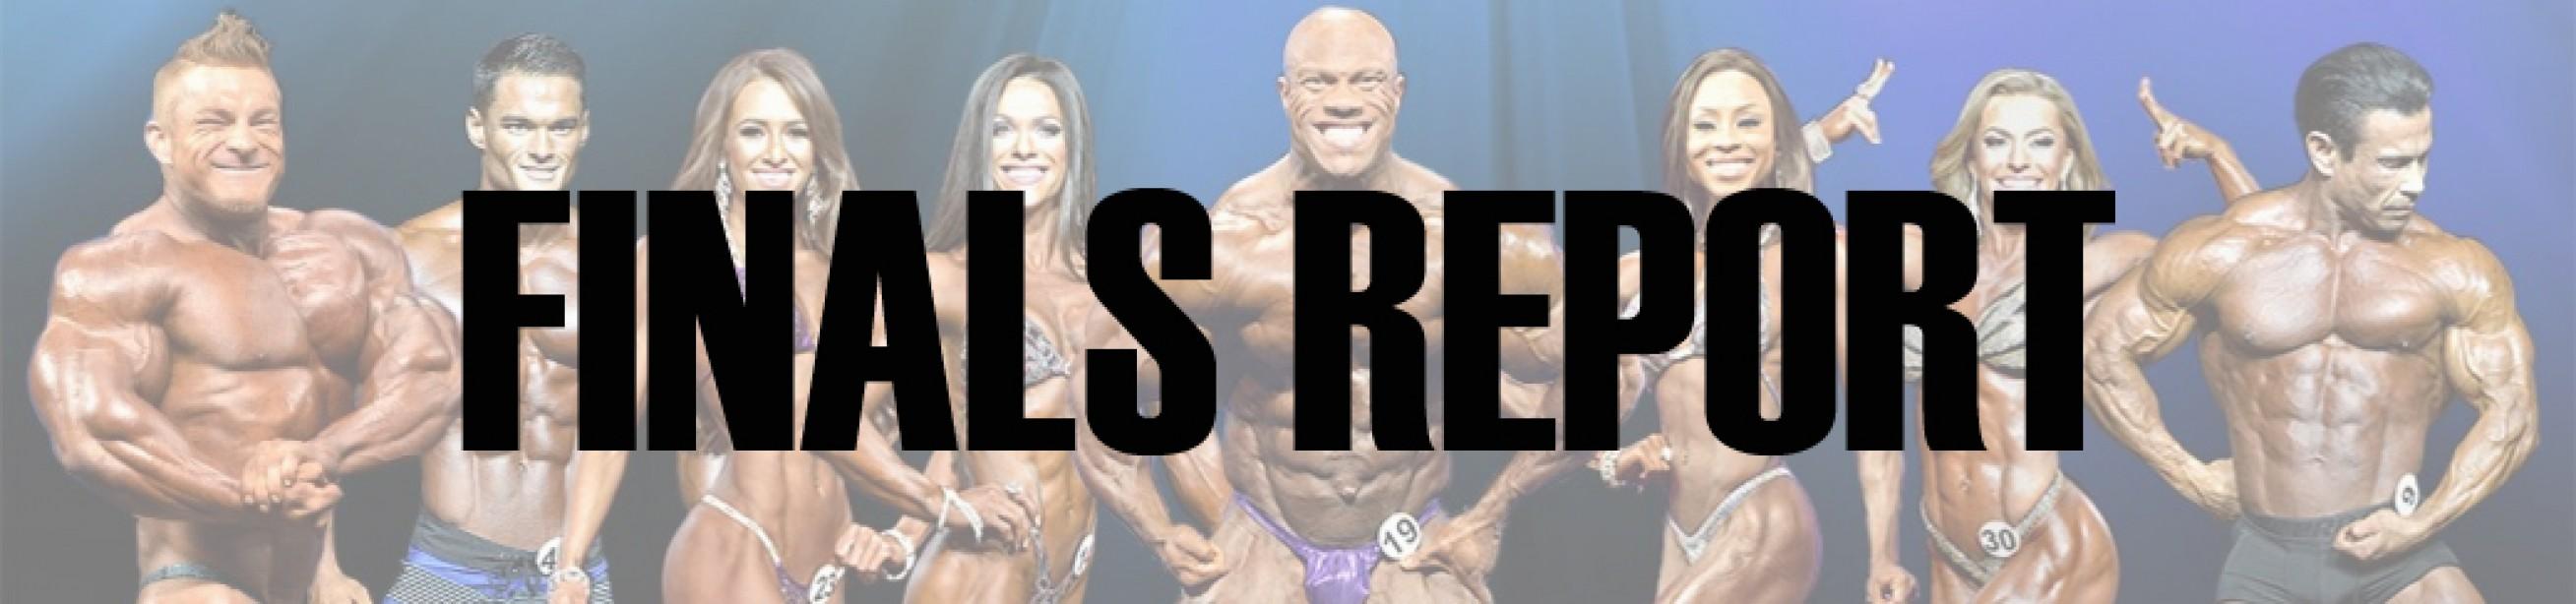 2017 Arnold Classic Finals Report